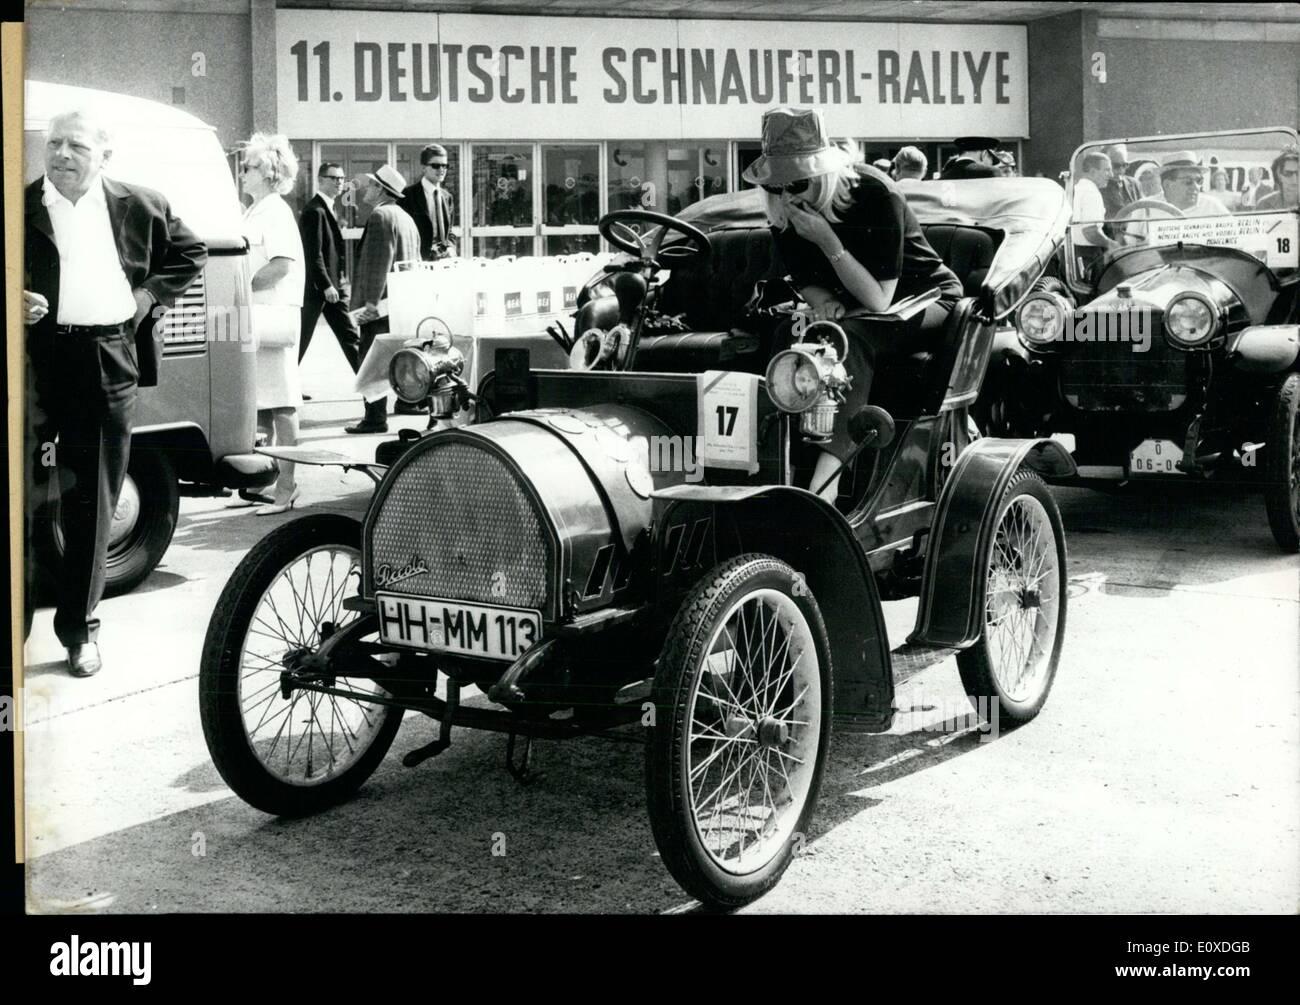 Jun. 11, 1966 - 141 auto veterans took part in the 11th Schnauferl ...